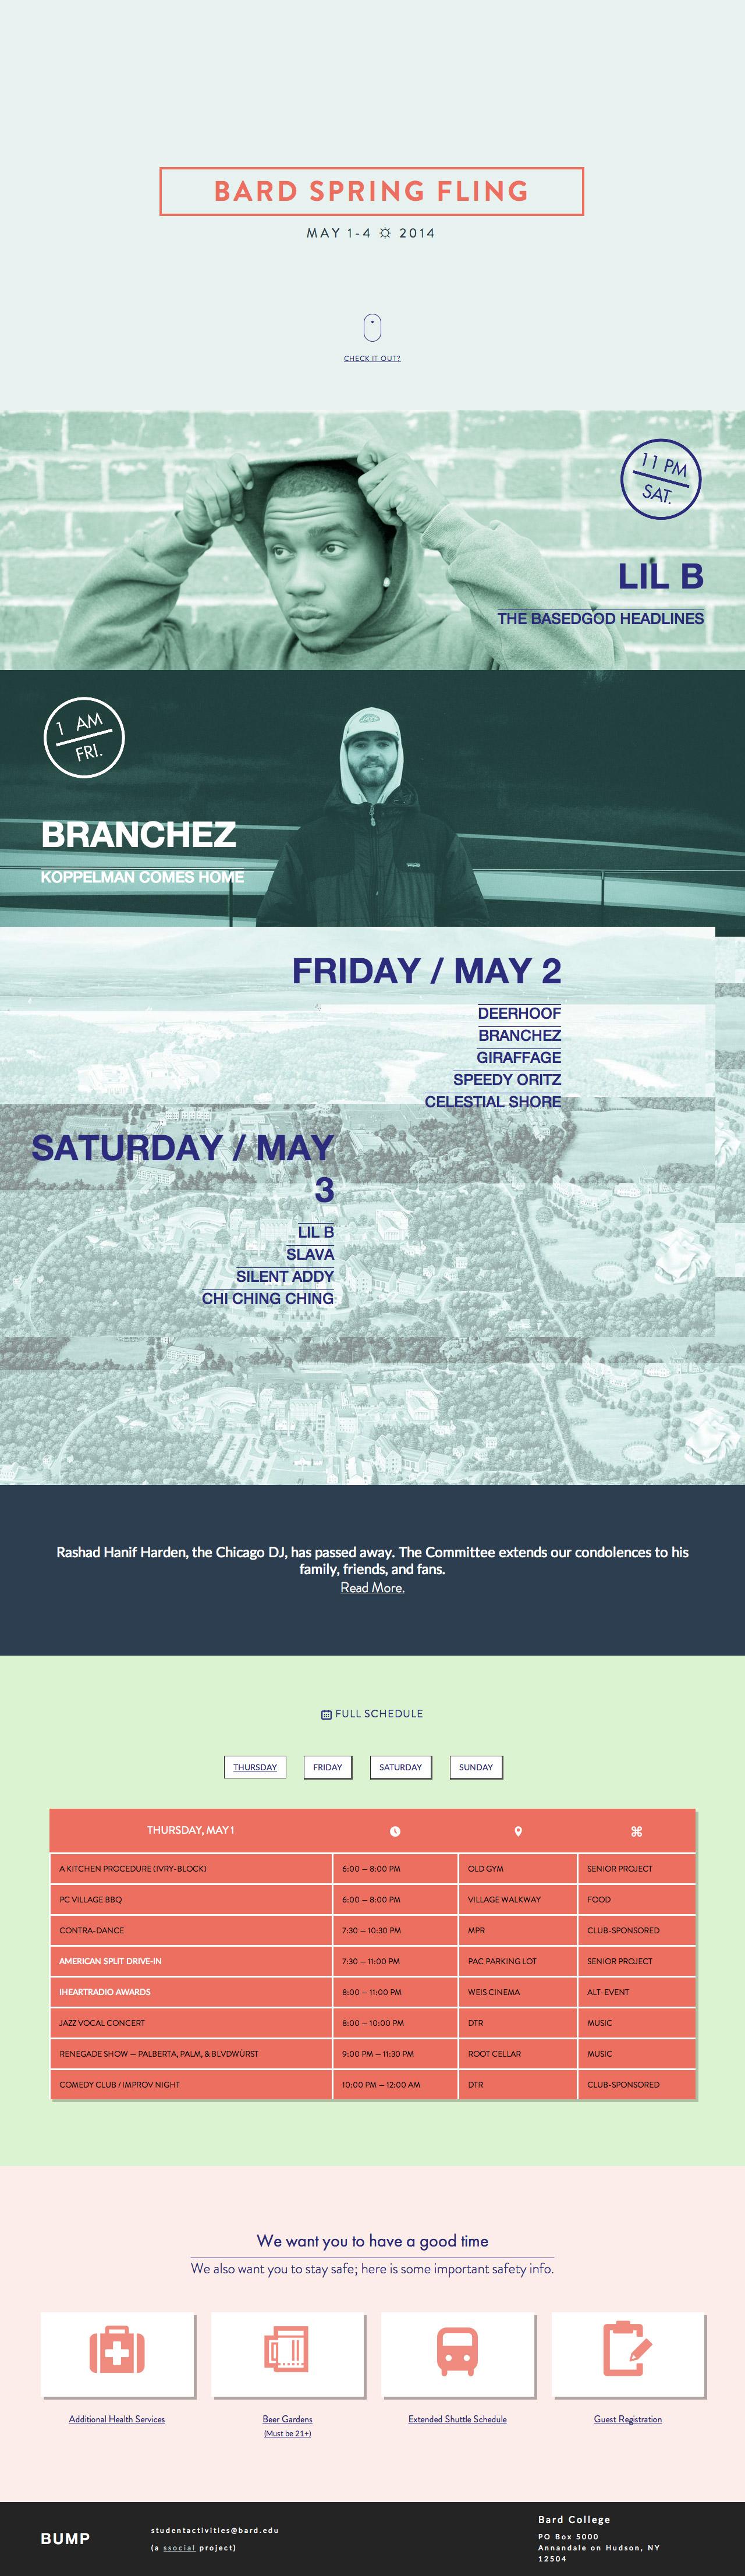 Bard ☼ Spring ☼ Fling Website Screenshot